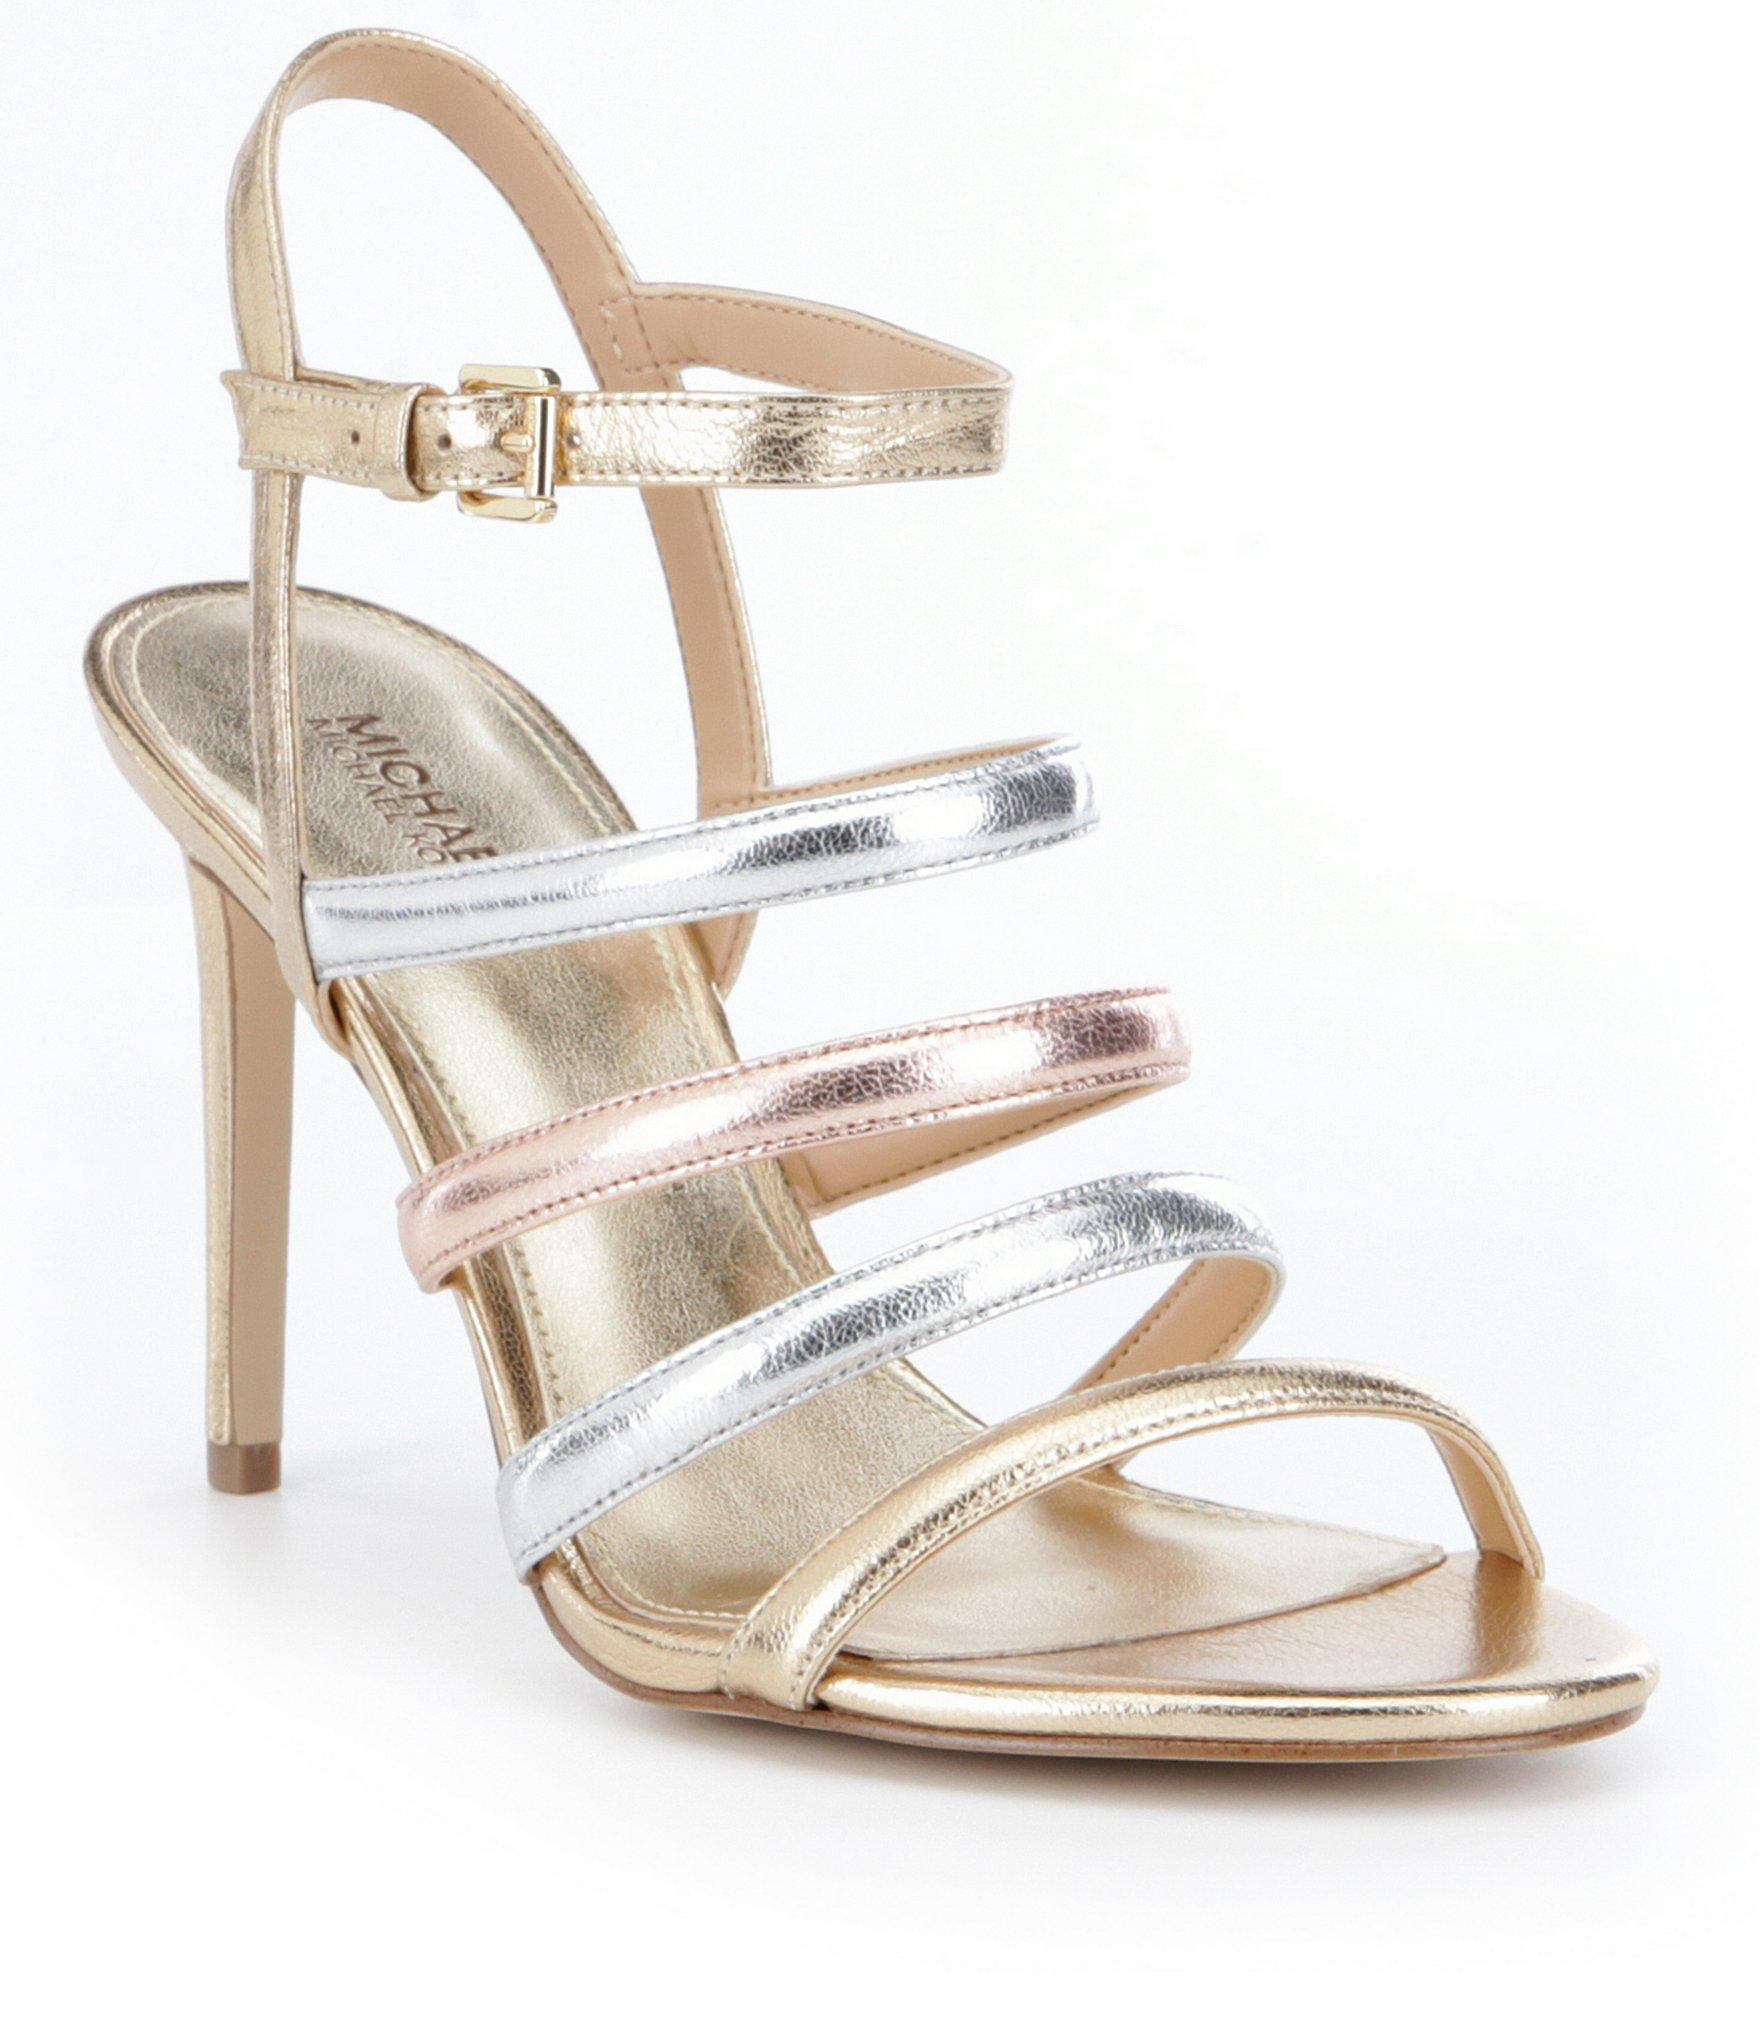 e530f01ea9f Lyst - MICHAEL Michael Kors Nantucket Sandals in Metallic